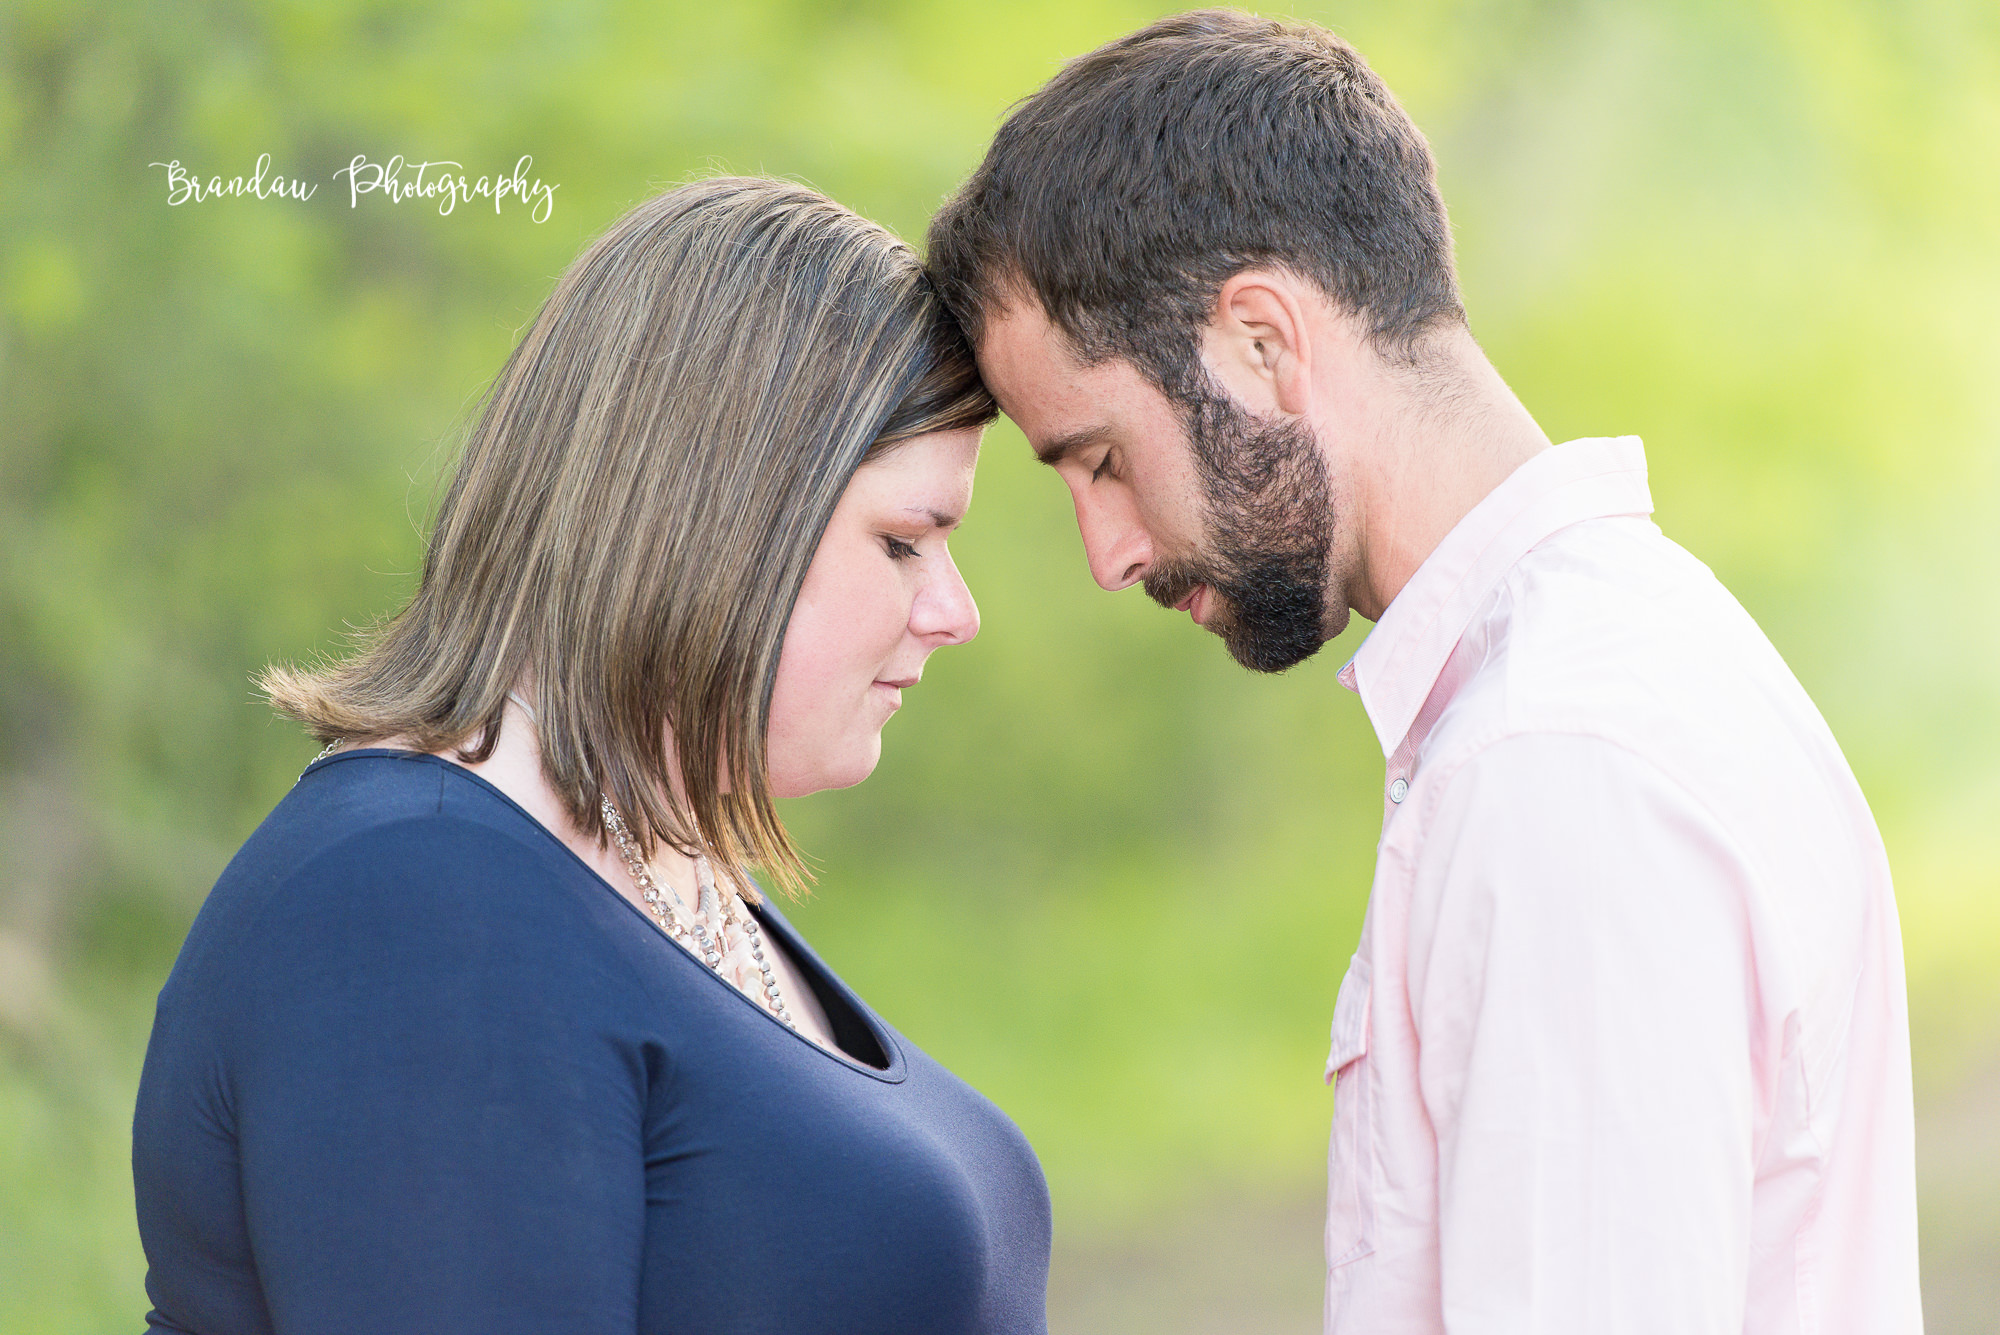 Man Woman Touching Foreheads_Brandau Photography-20.jpg